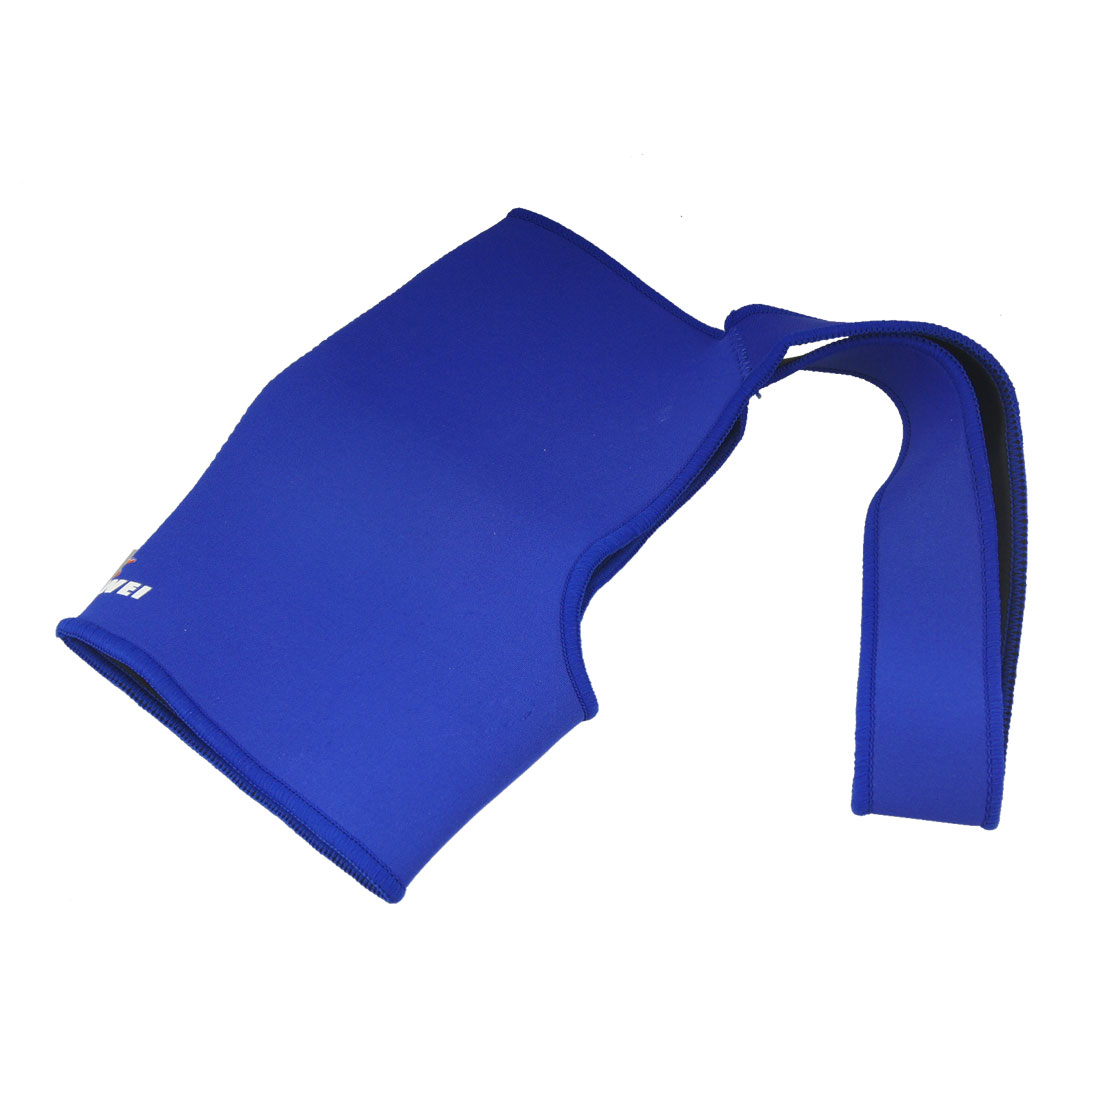 Blue Elasitc Neoprene Protective Single Shoulder Brace Support